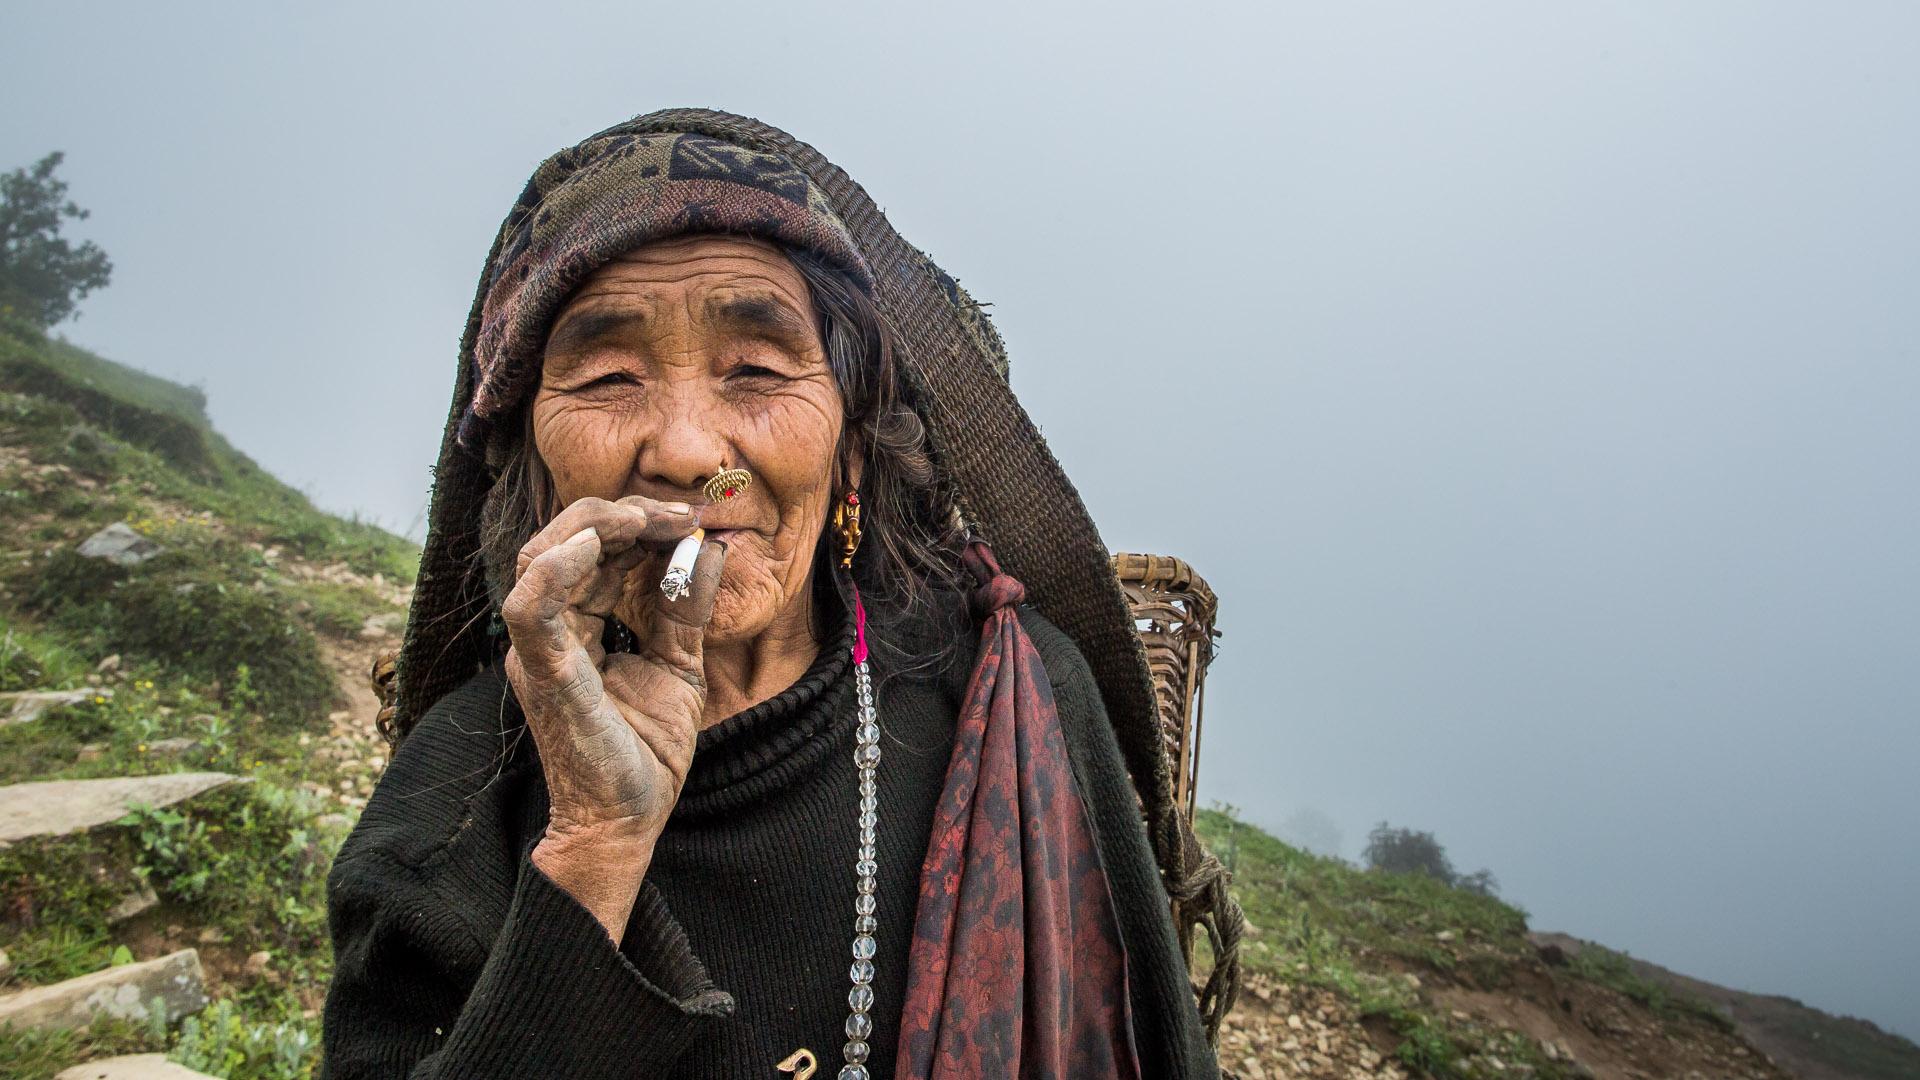 Gurung lady smoking a cigarette.